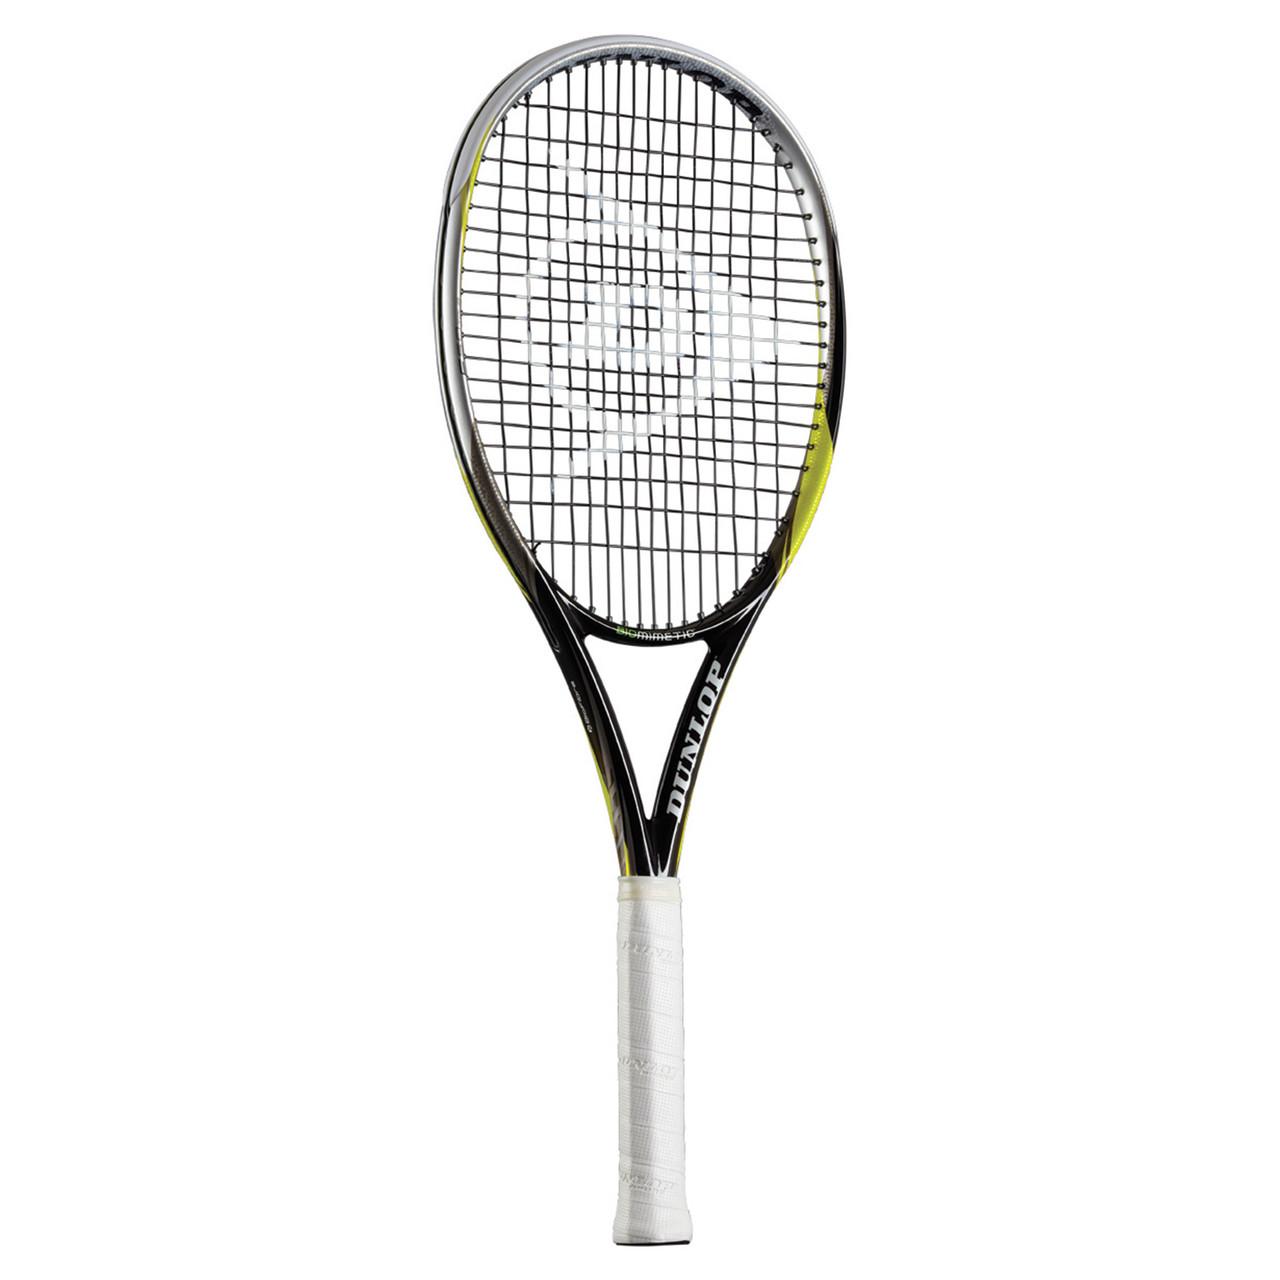 Теннисная ракетка Dunlop D Tr Biomimetic F5.0 Tour G3 Hl 676277-NC